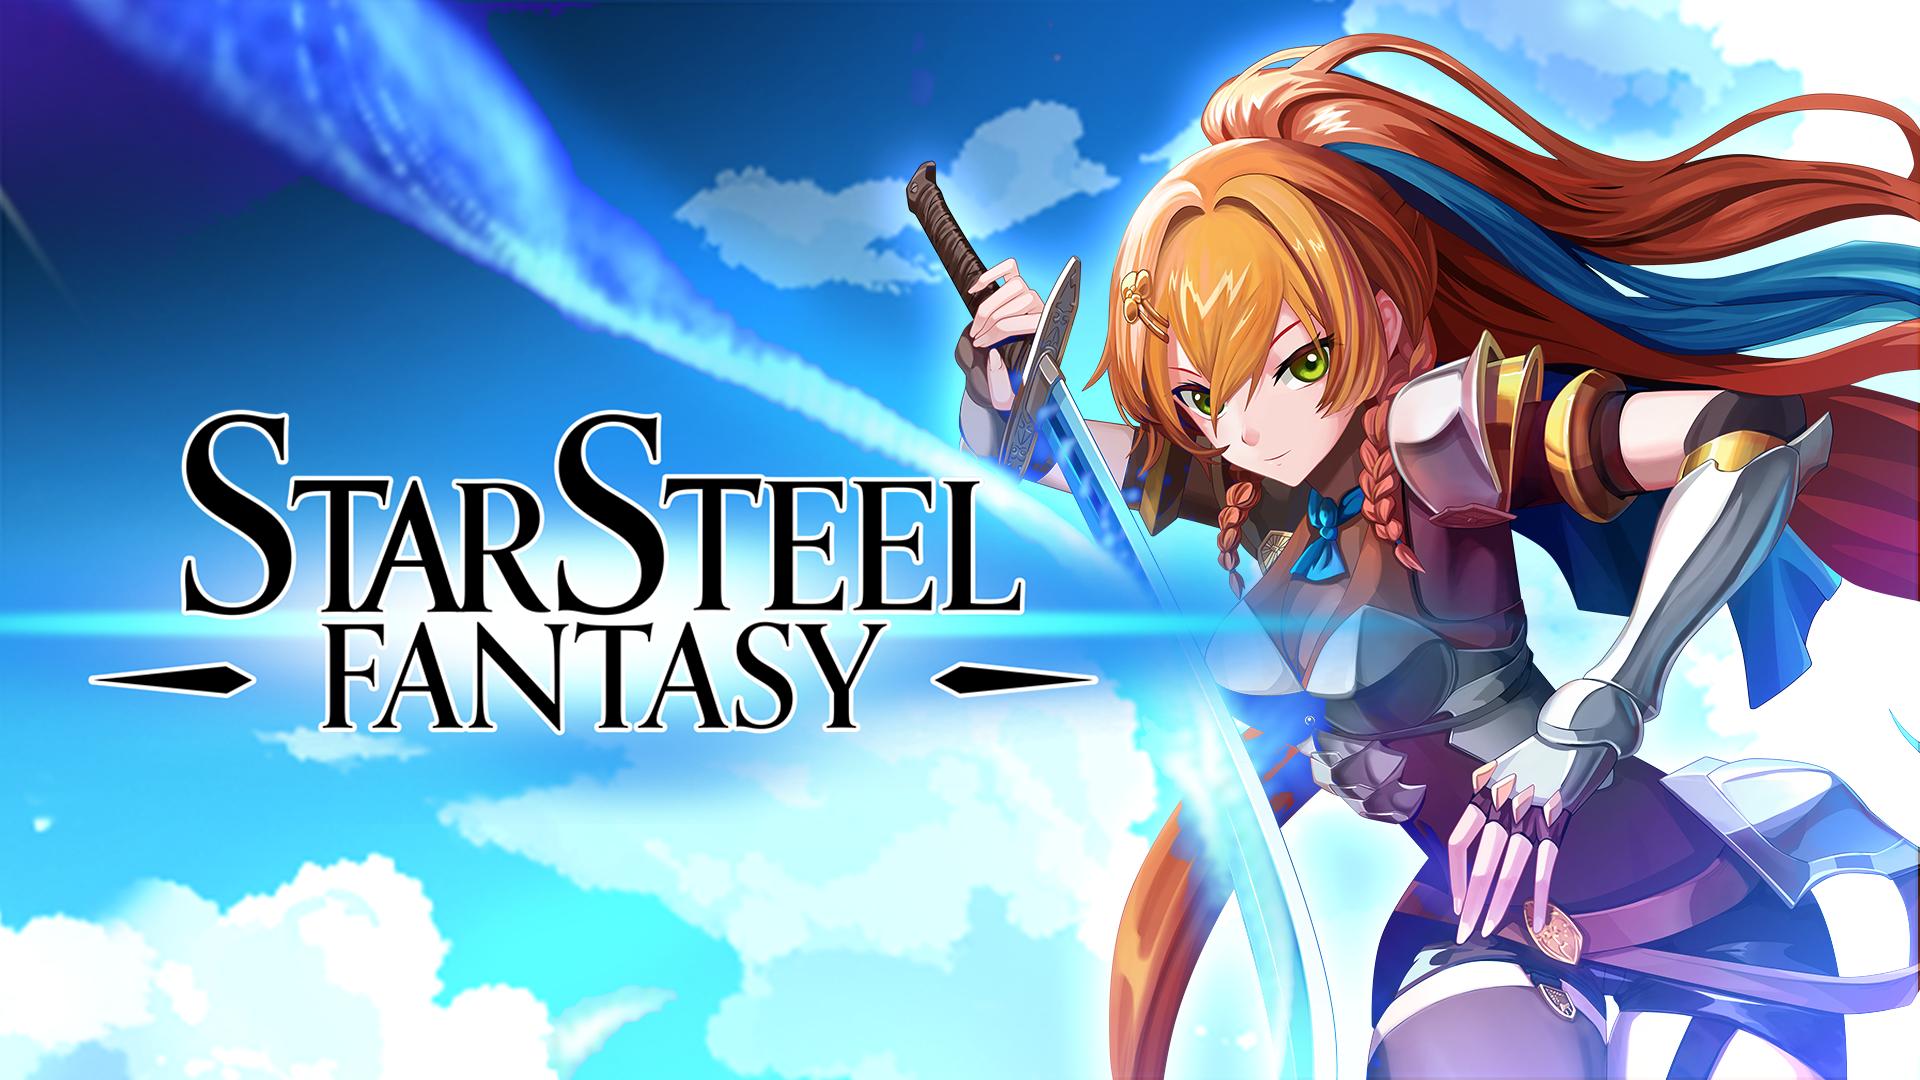 Starsteel Fantasy